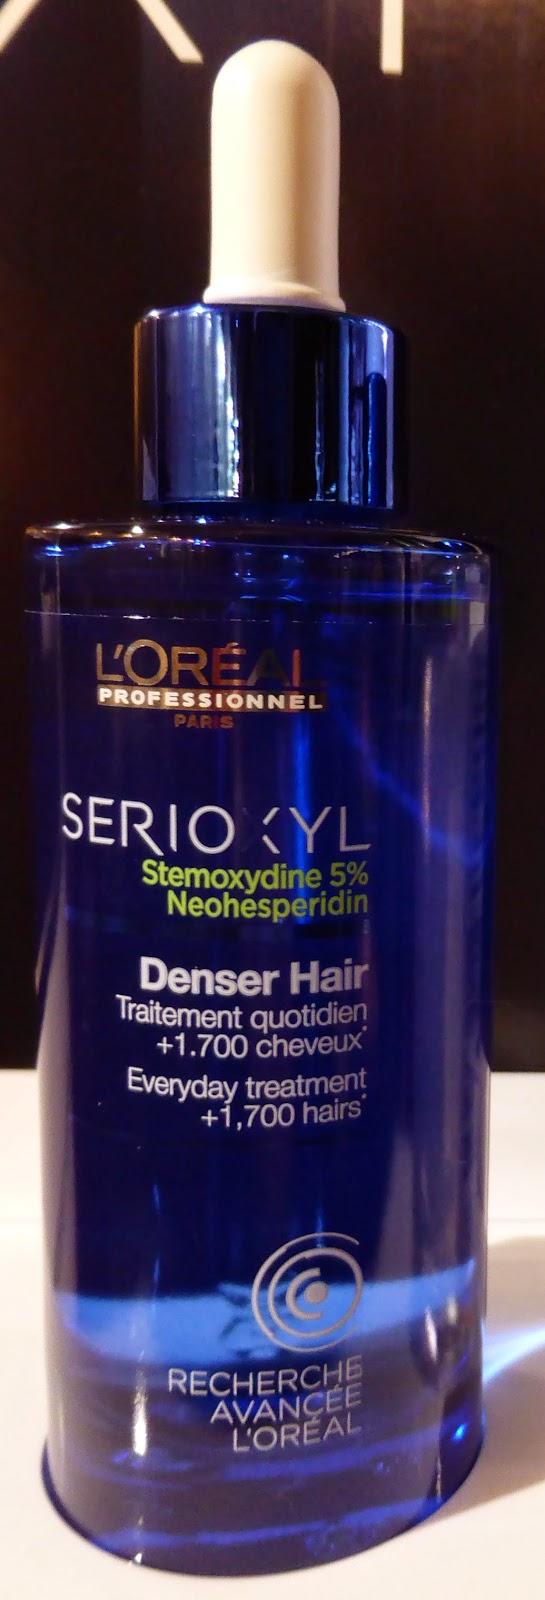 Serioxyl Denser Hair, + 1700 cheveux en 3 mois, L'Oréal Recherche Avancée.